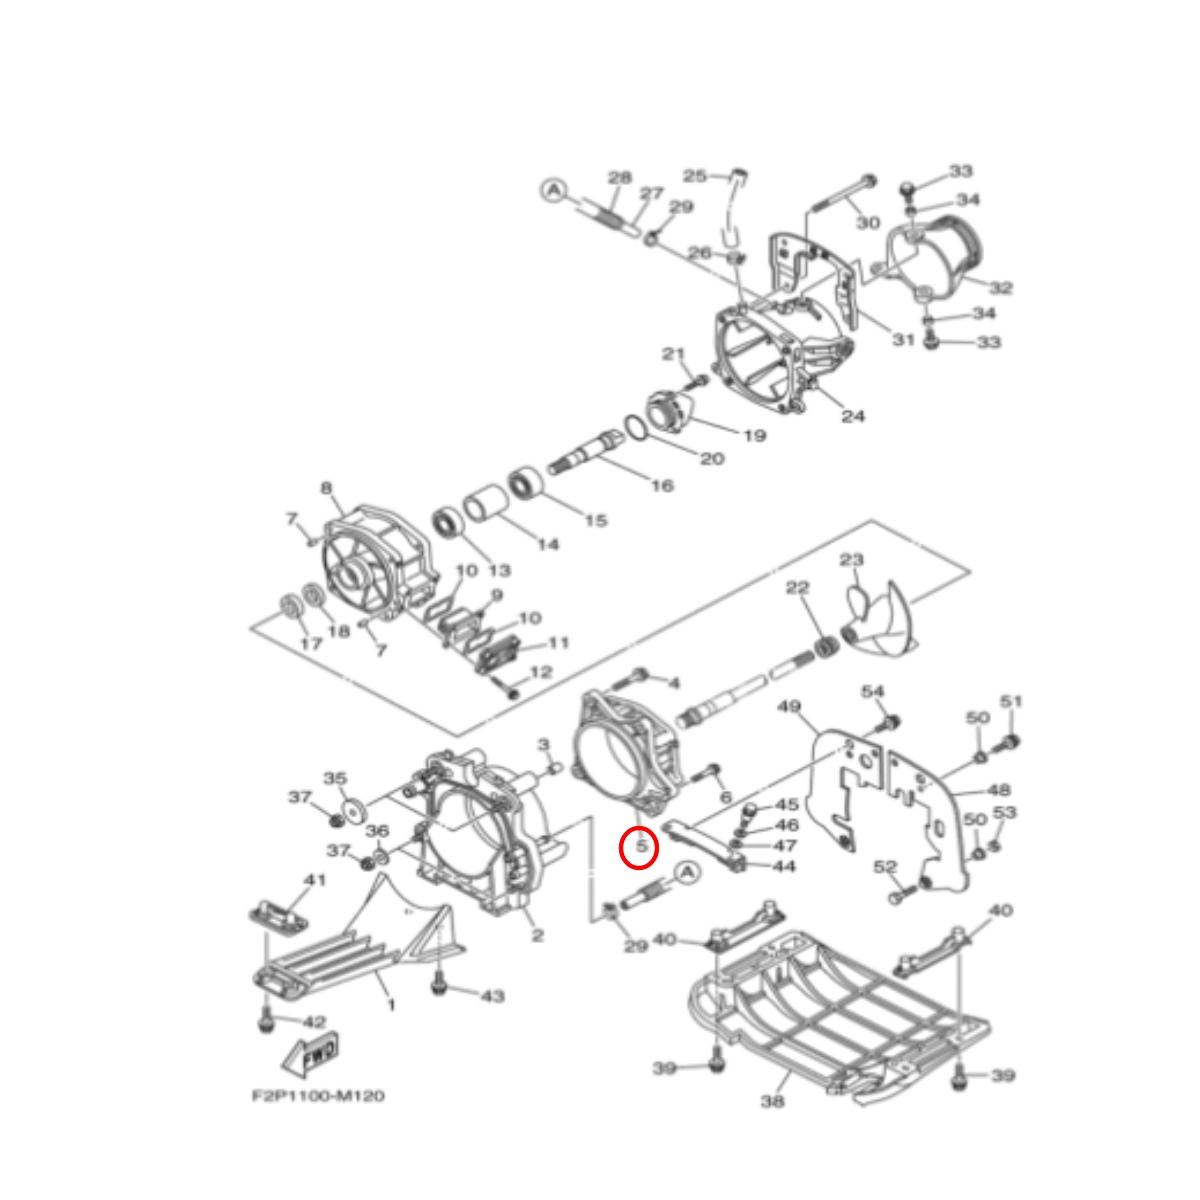 Cinta de Turbina para Jet Ski Yamaha 800/1200/1300R 4 Tempos  - Radical Peças - Peças para Jet Ski